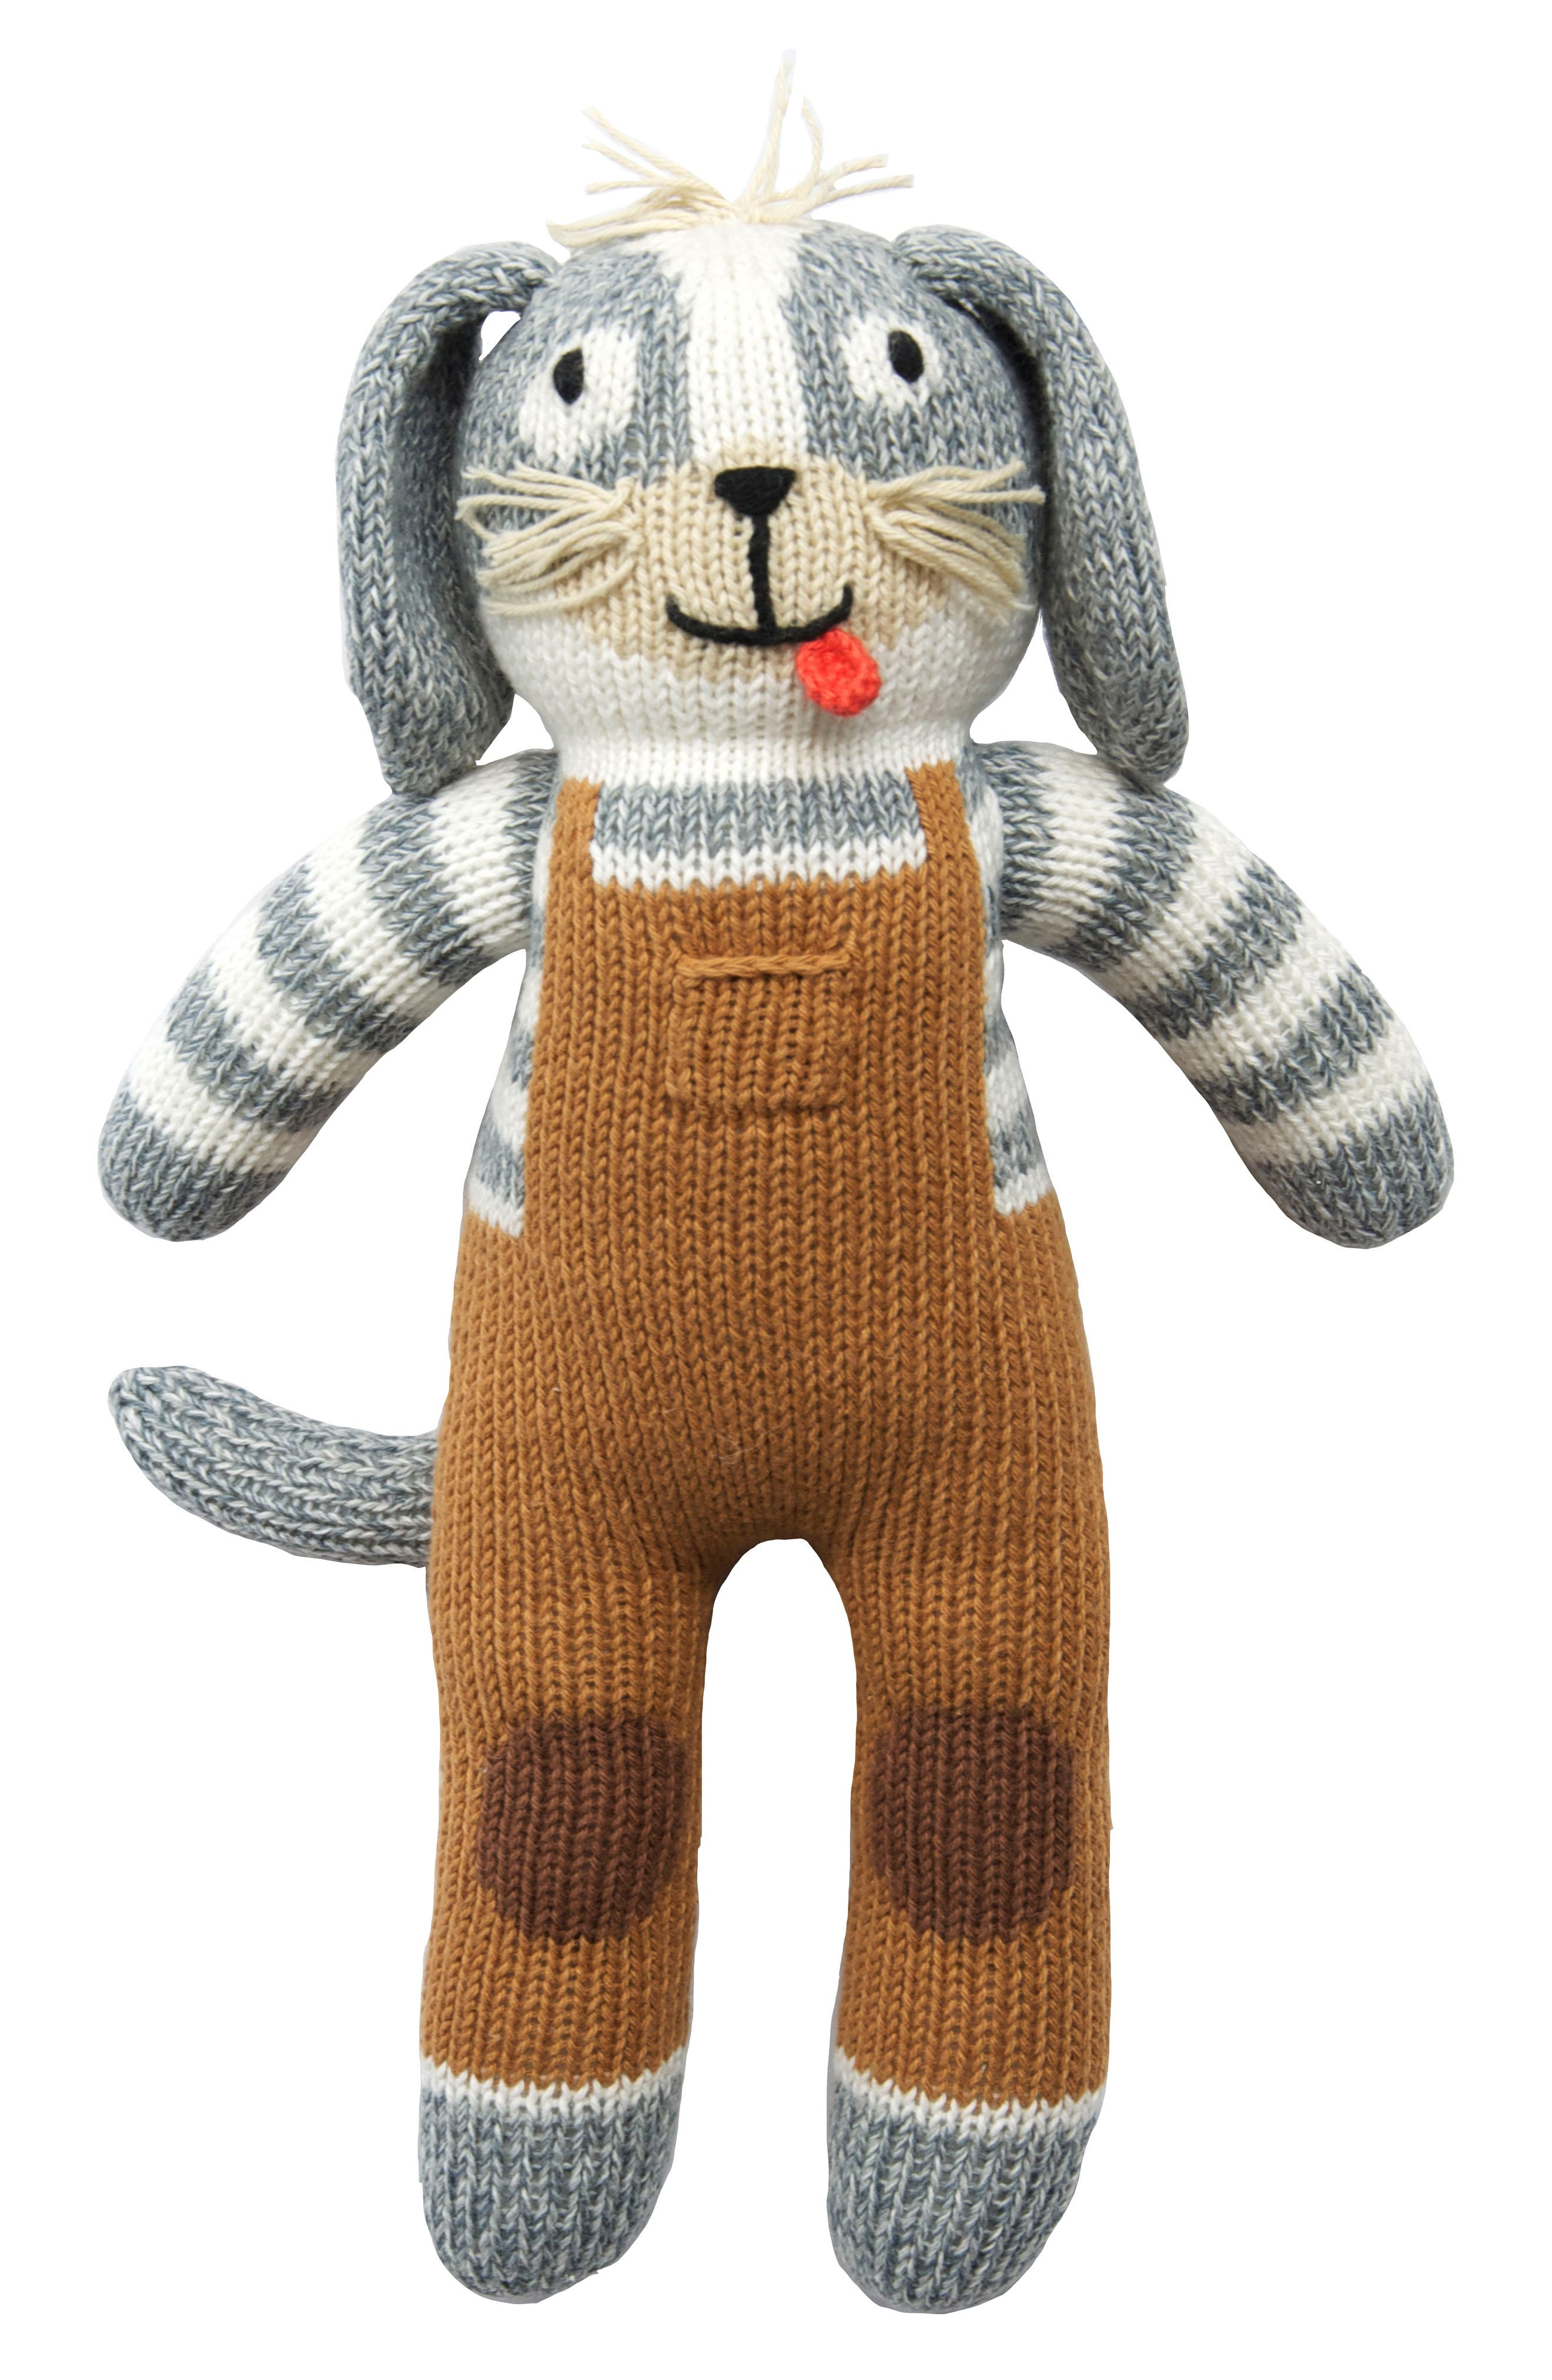 Blabla Toutou The Dog Hand Knit Doll